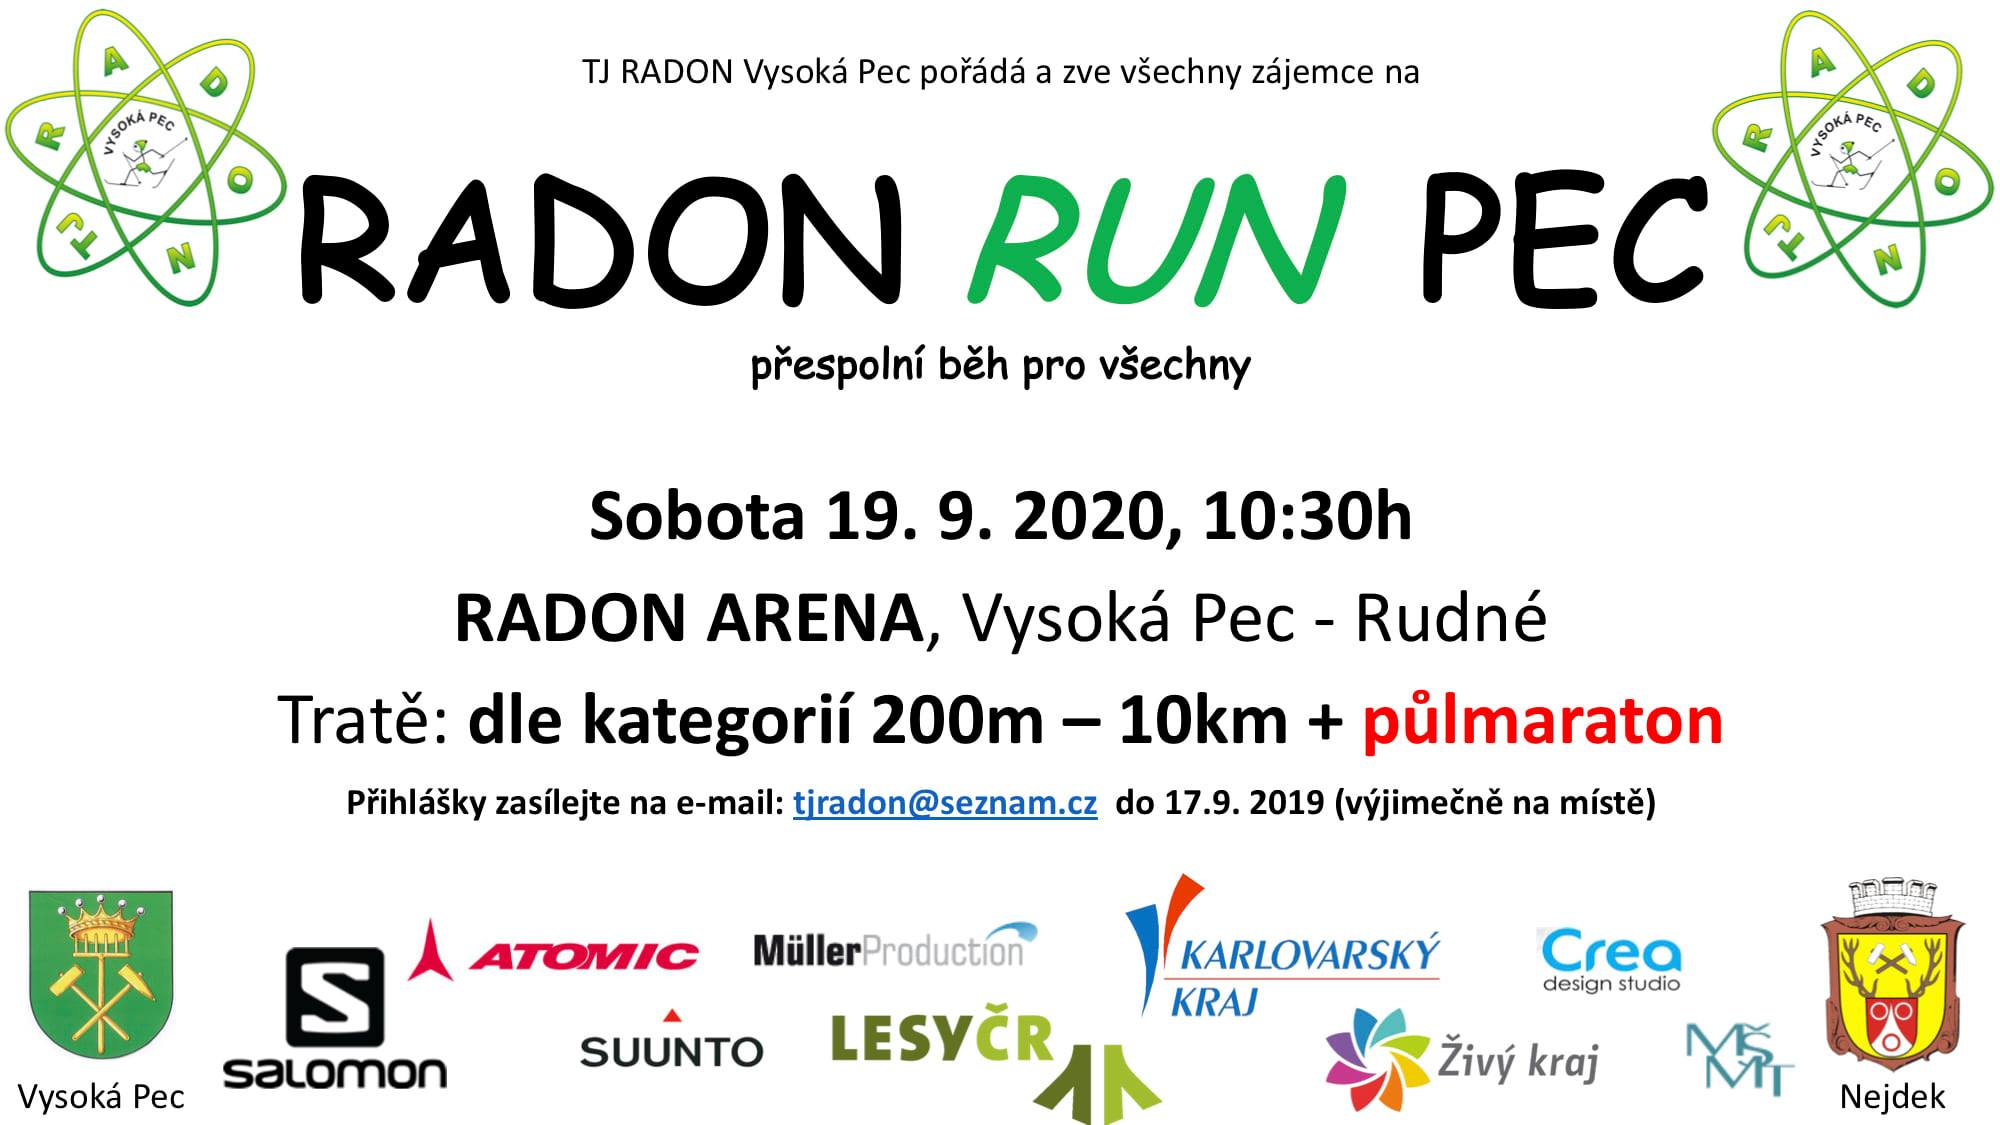 radon_run_pec-2020